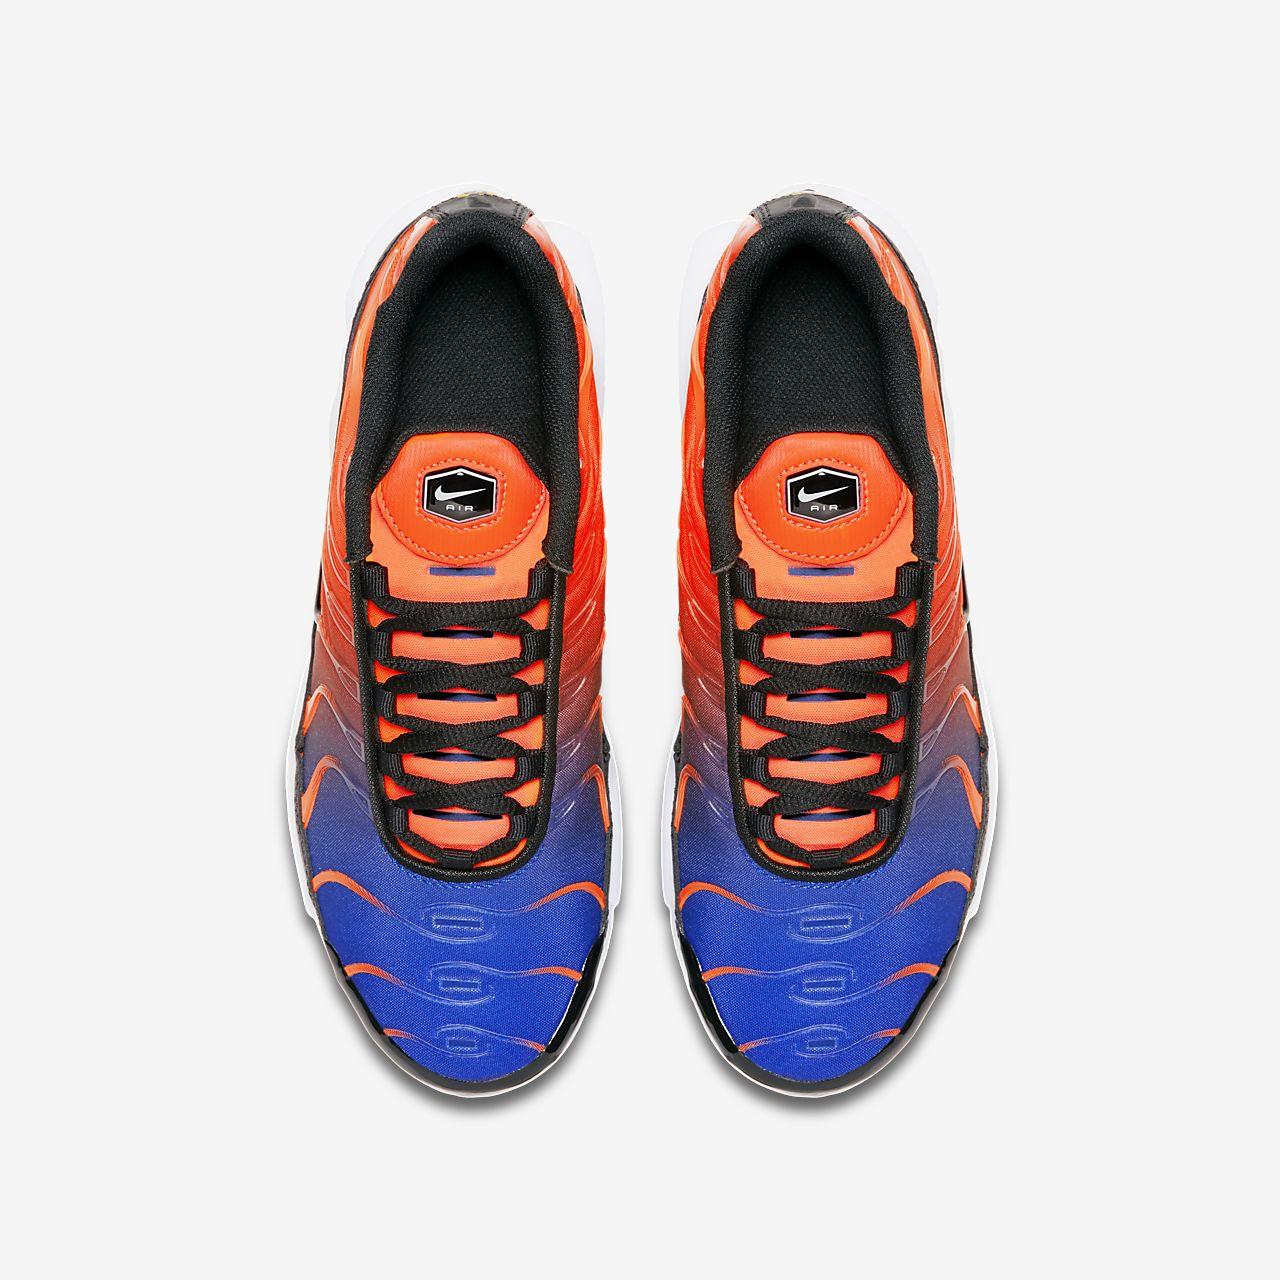 quality design 51ba7 b9e28 Nike Air Max Plus TN SE sko til store barn,nike tn barn